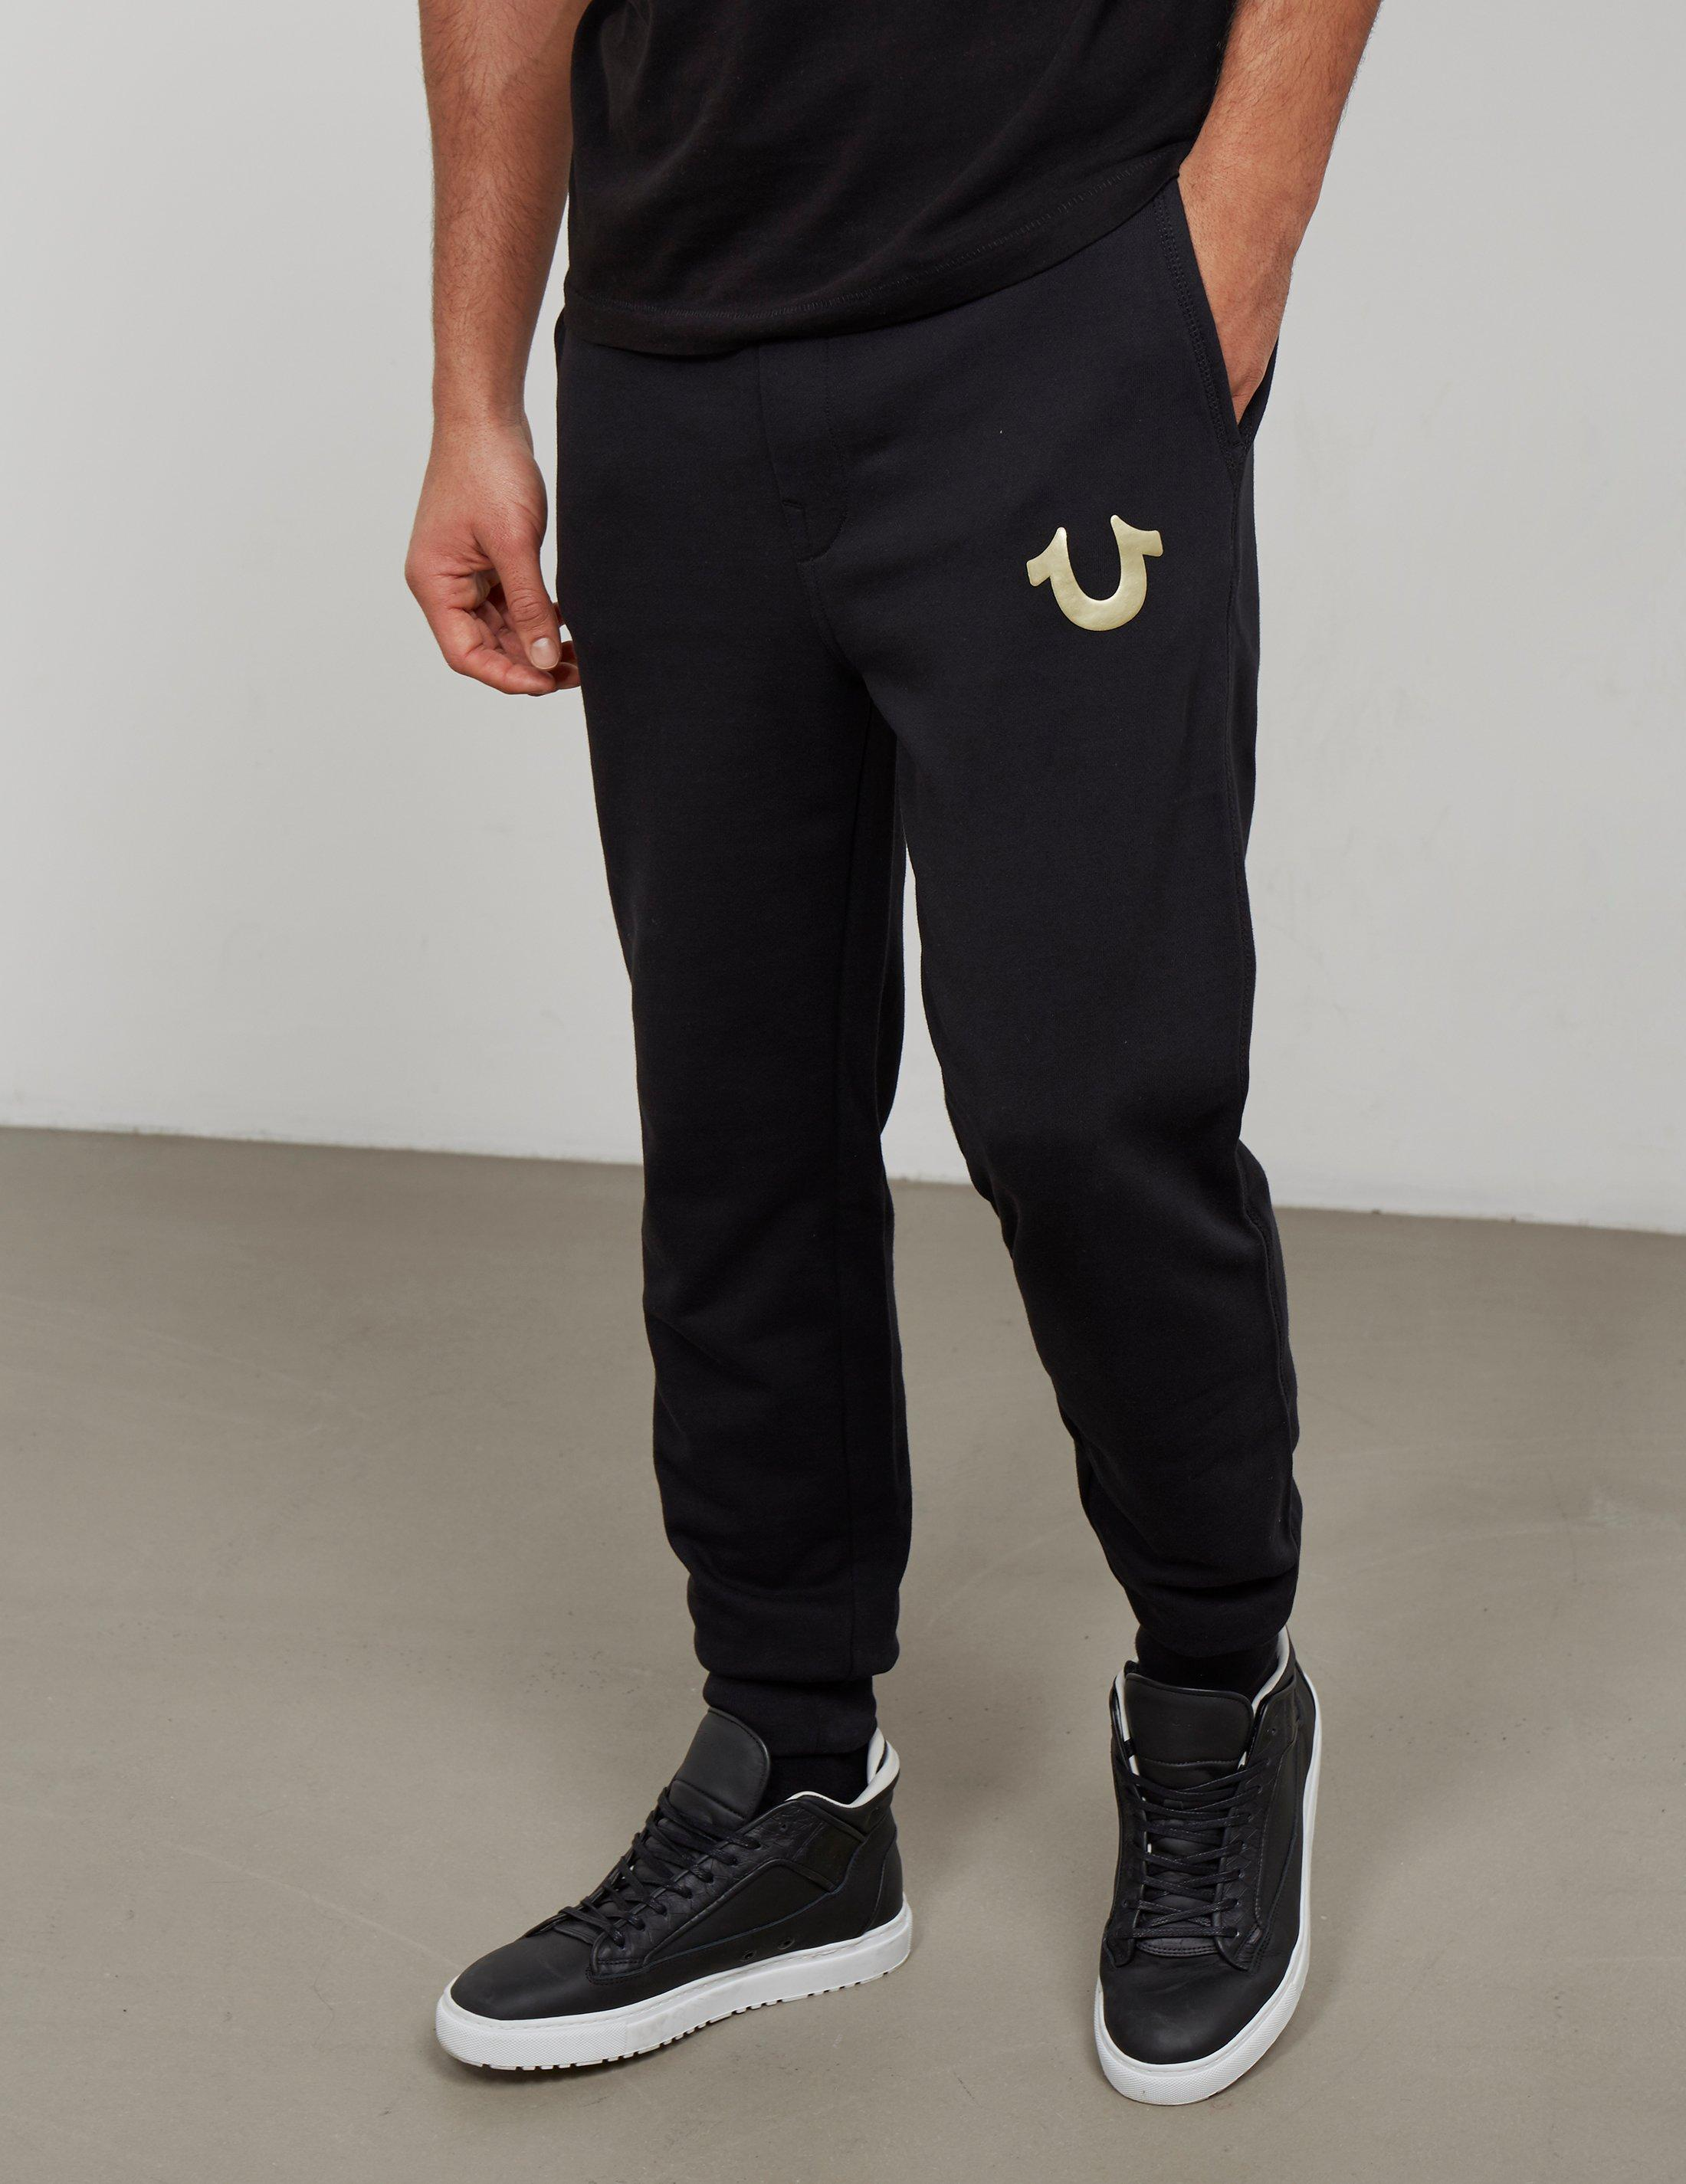 Lyst - True Religion Mens Gold Puff Cuffed Track Pants Black in ... 62fe06f36fc7